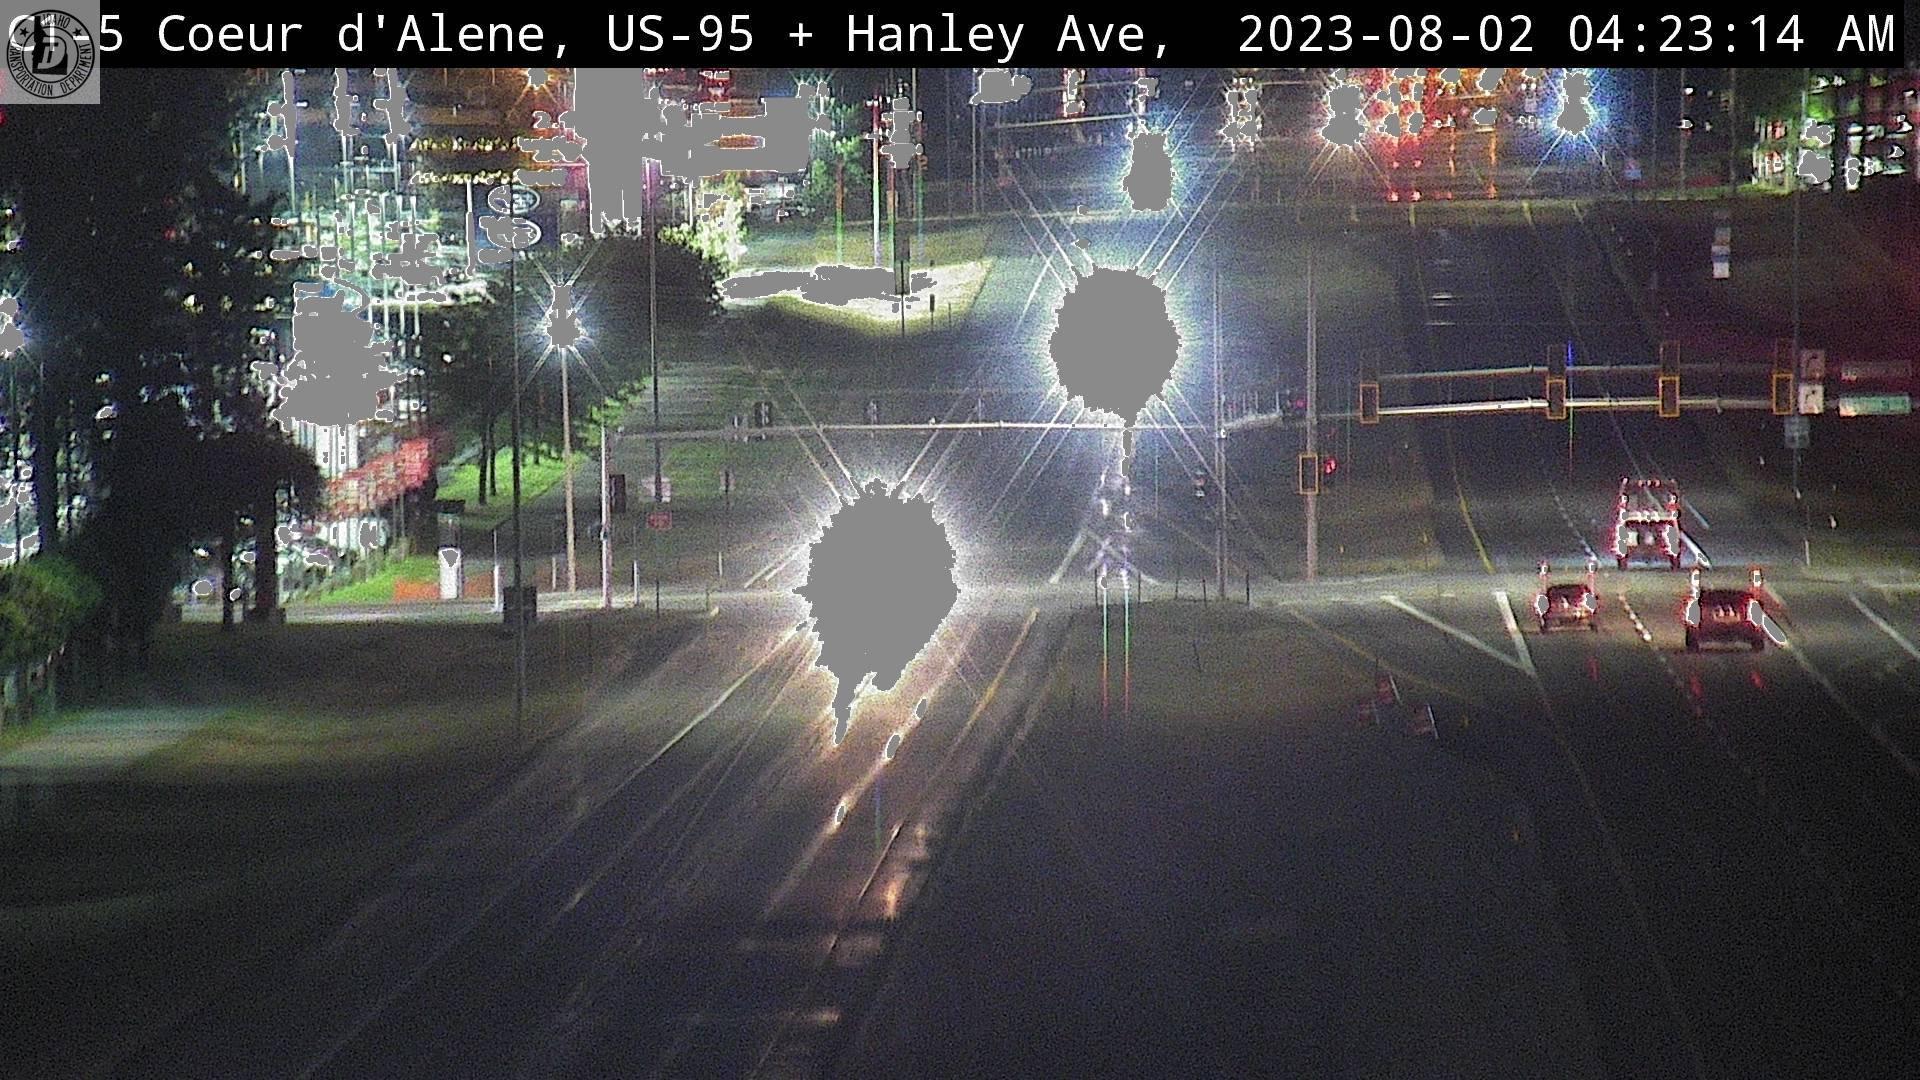 Hanley Ave